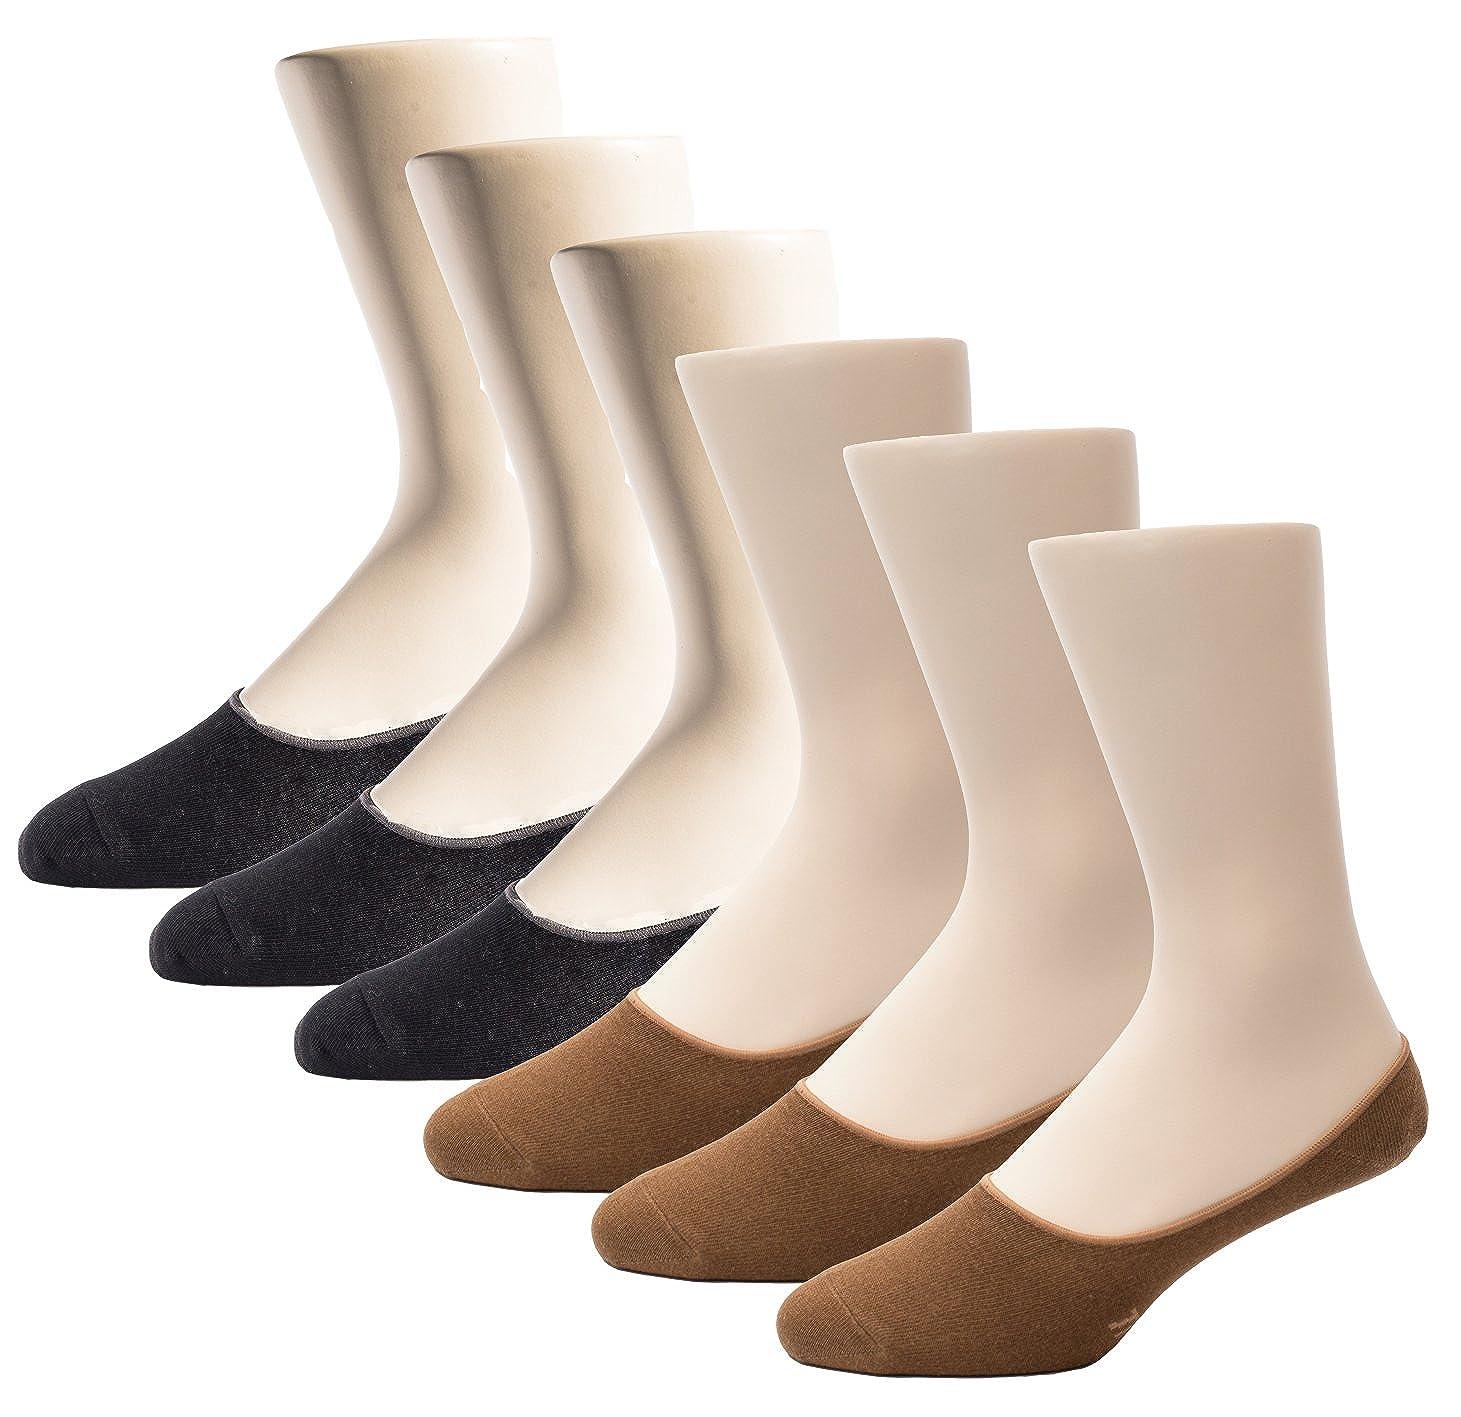 Amazon.com: Thirty48 Men No Show Socks, Loafer Socks Boat ...